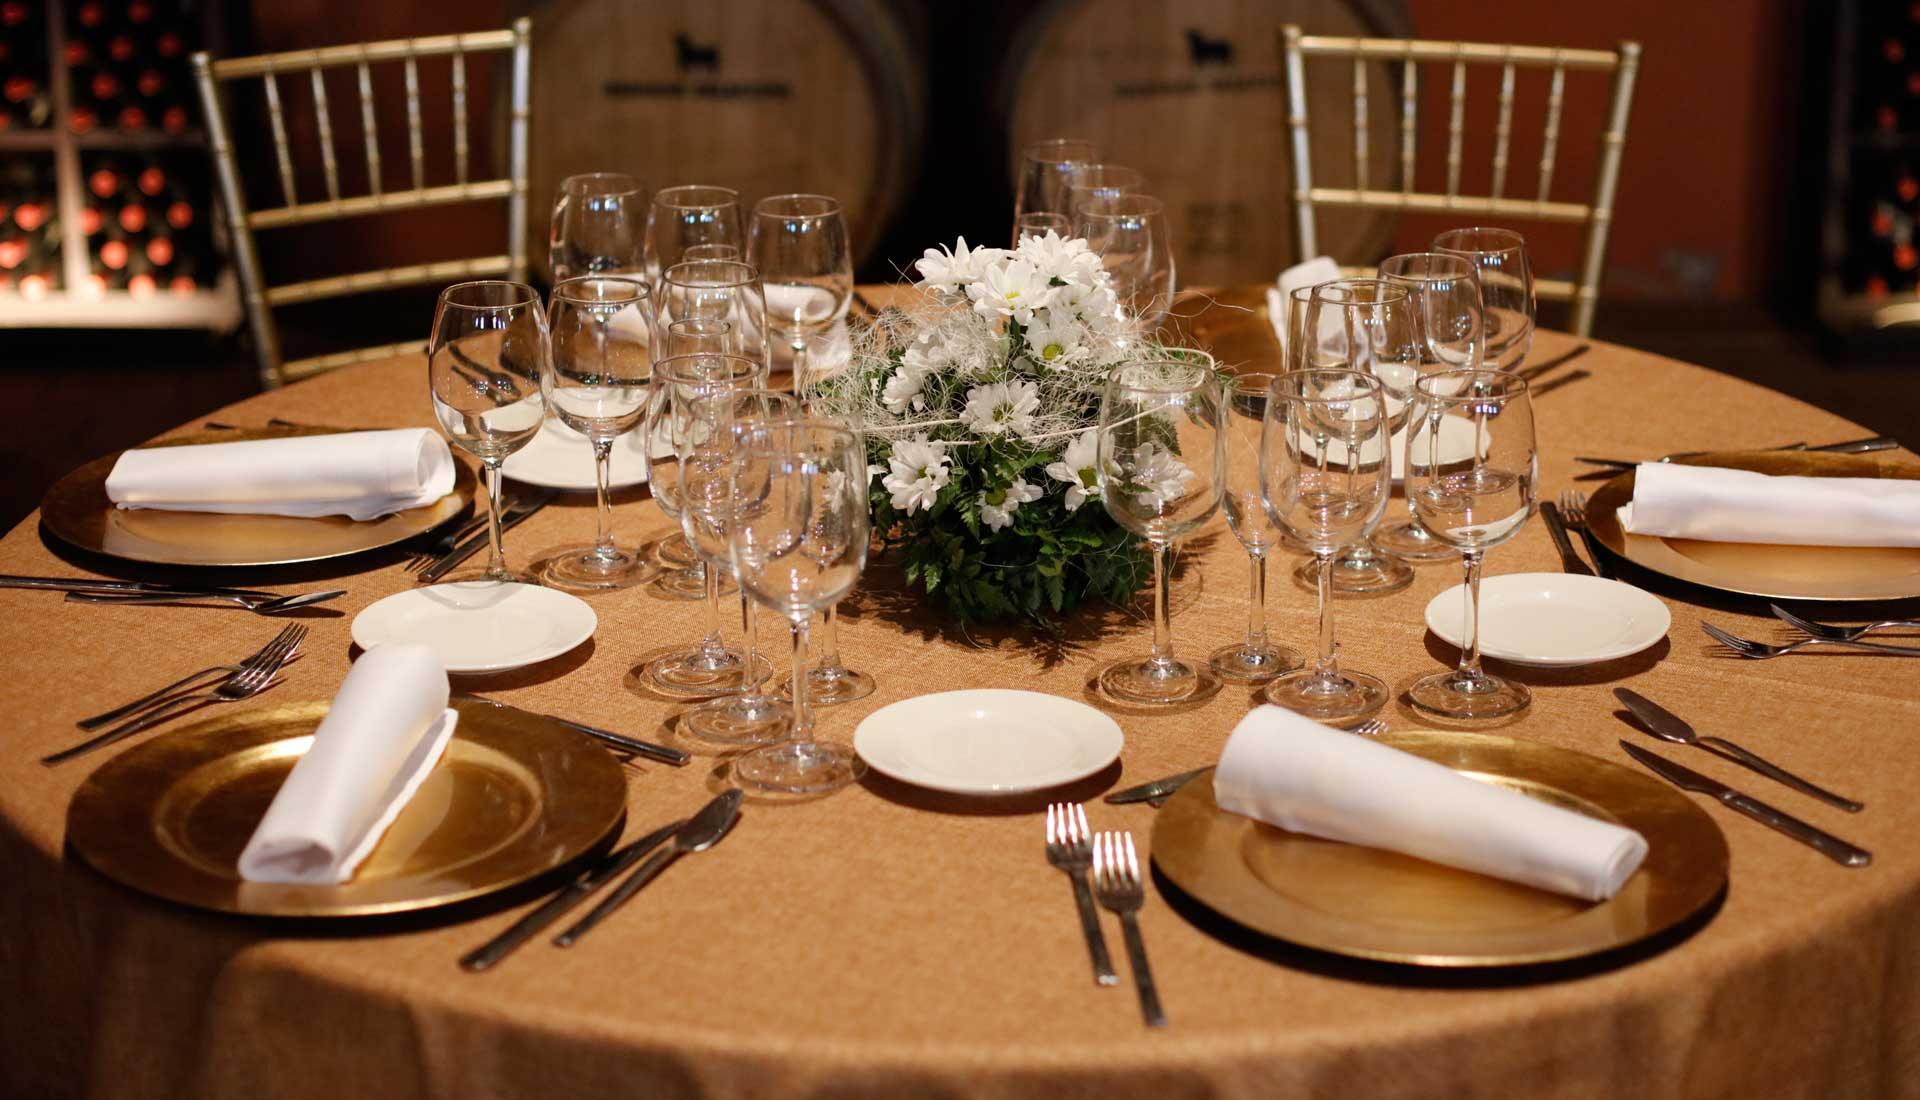 Beltran Catering Bodas y eventos en Bodegas Osborne